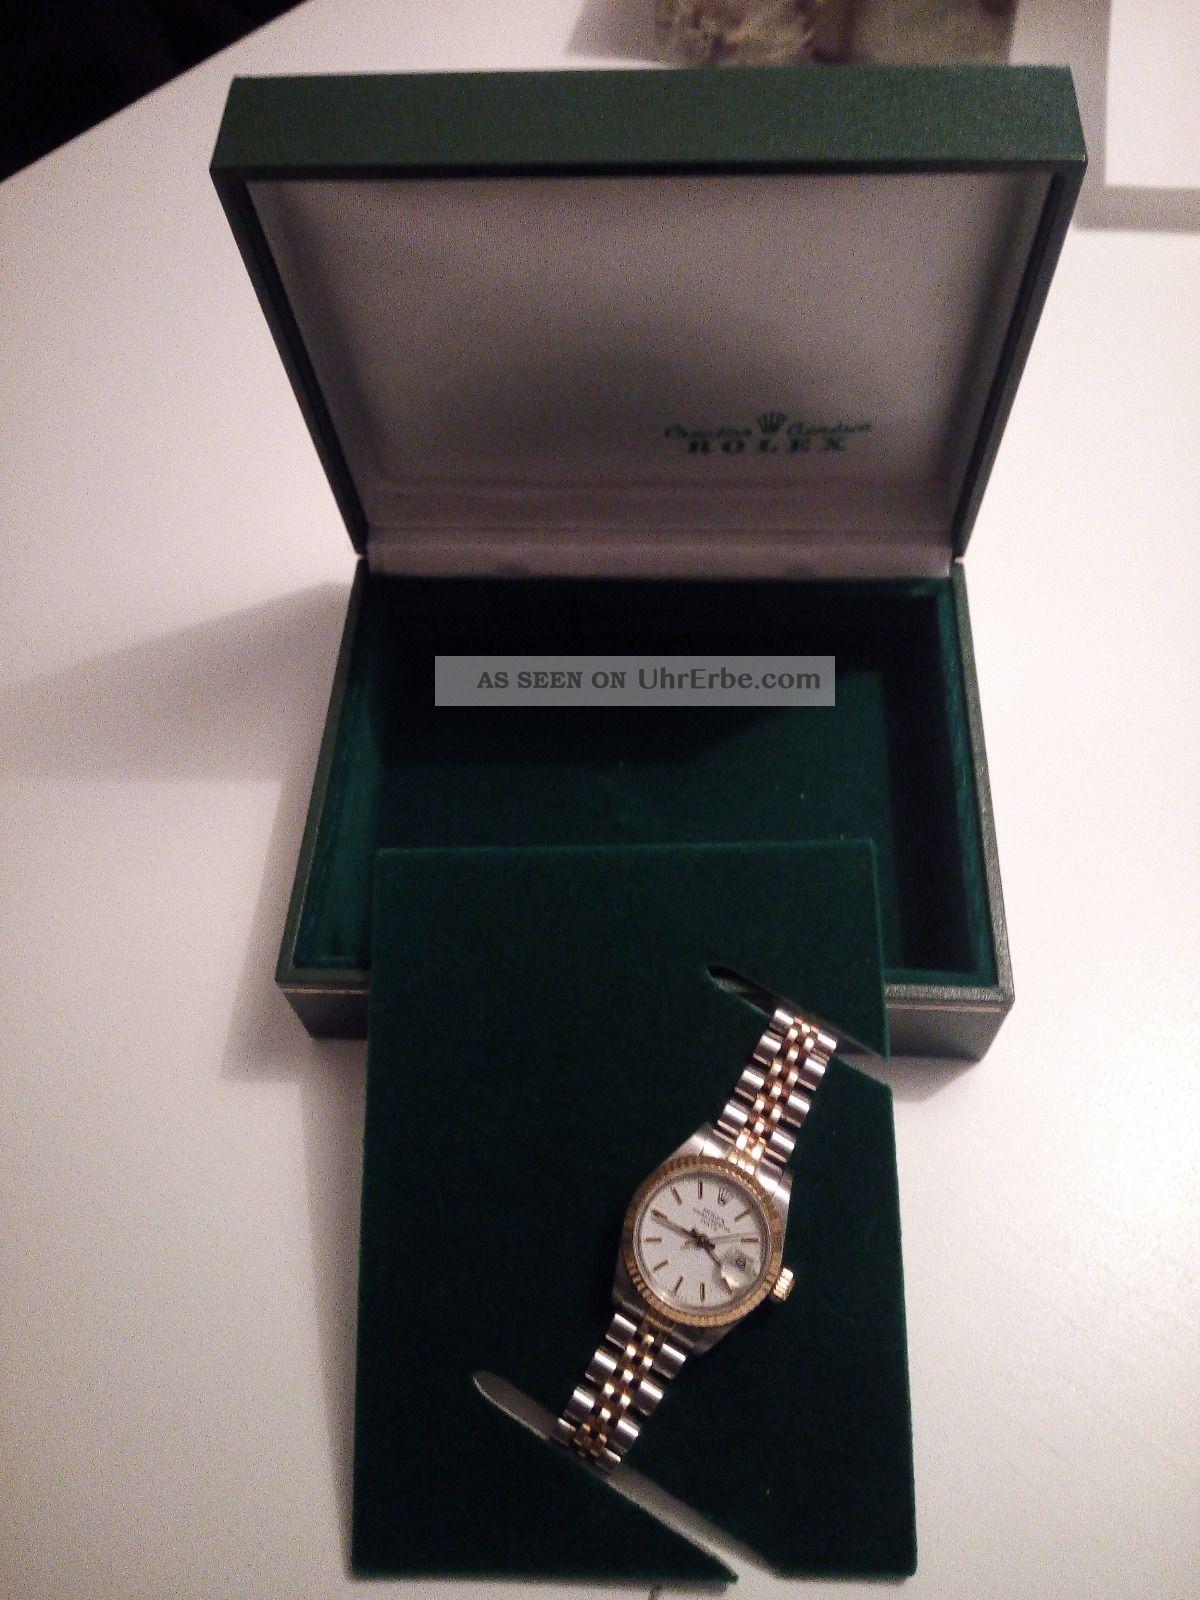 Rolex Oyster Perpetual Date Armbanduhr Armbanduhren Bild